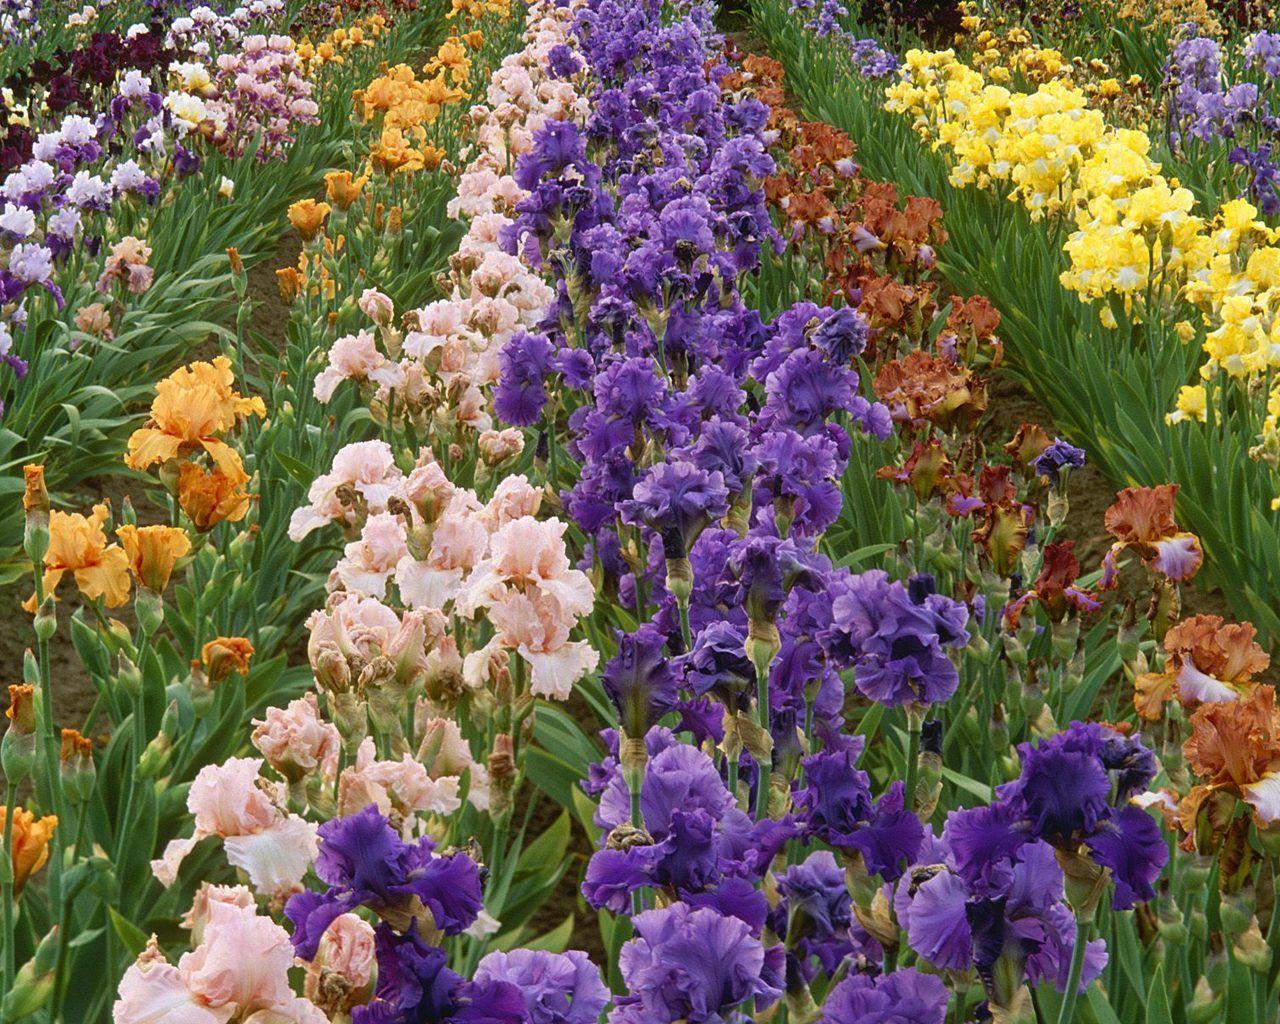 All the colors of the iris flower iris farm colors farm flowers all the colors of the iris flower iris farm colors farm izmirmasajfo Gallery